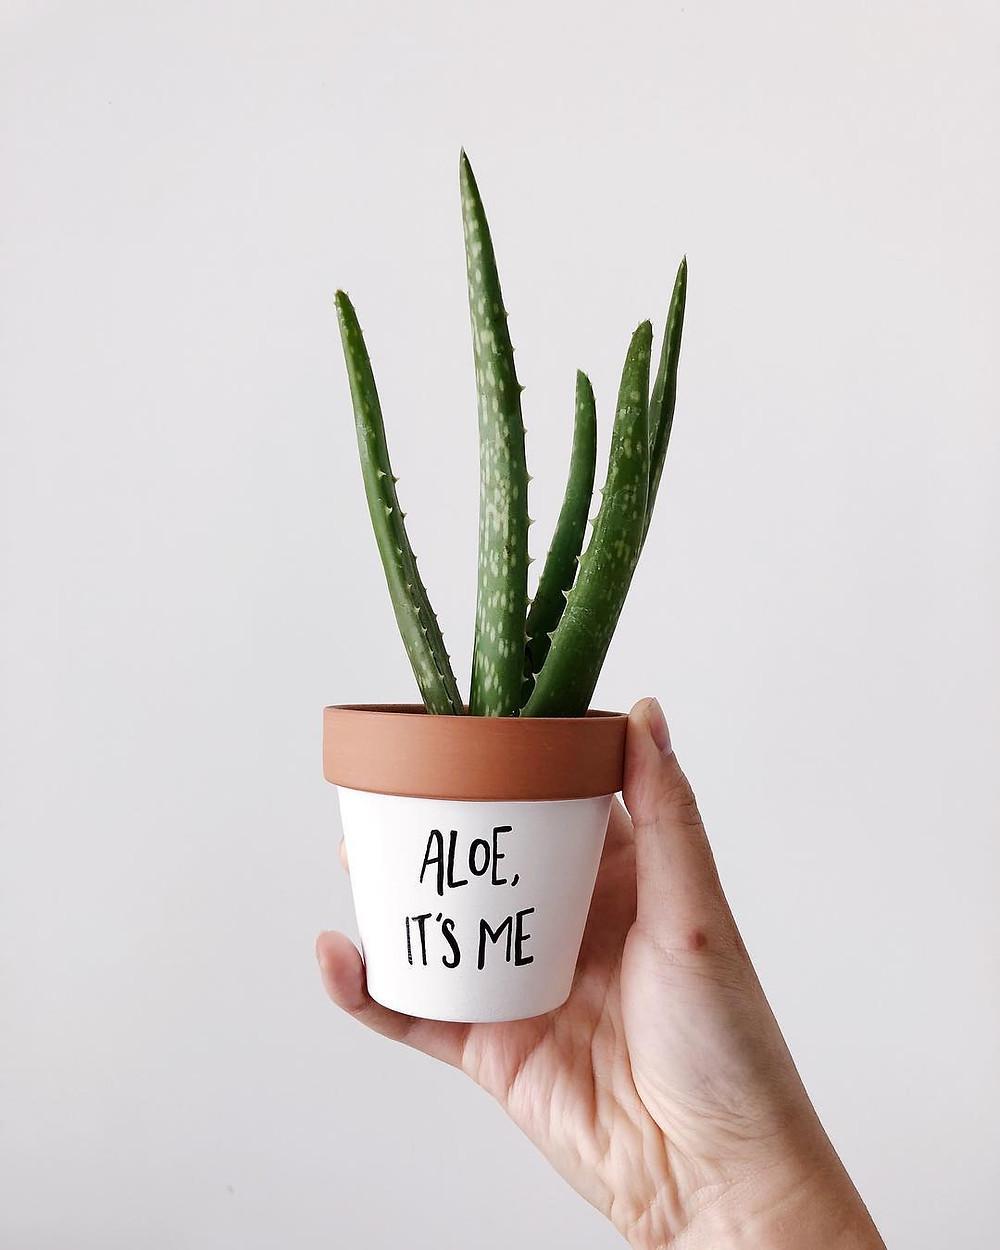 Aloe Vera Healthy Home Houseplants Air Purifying